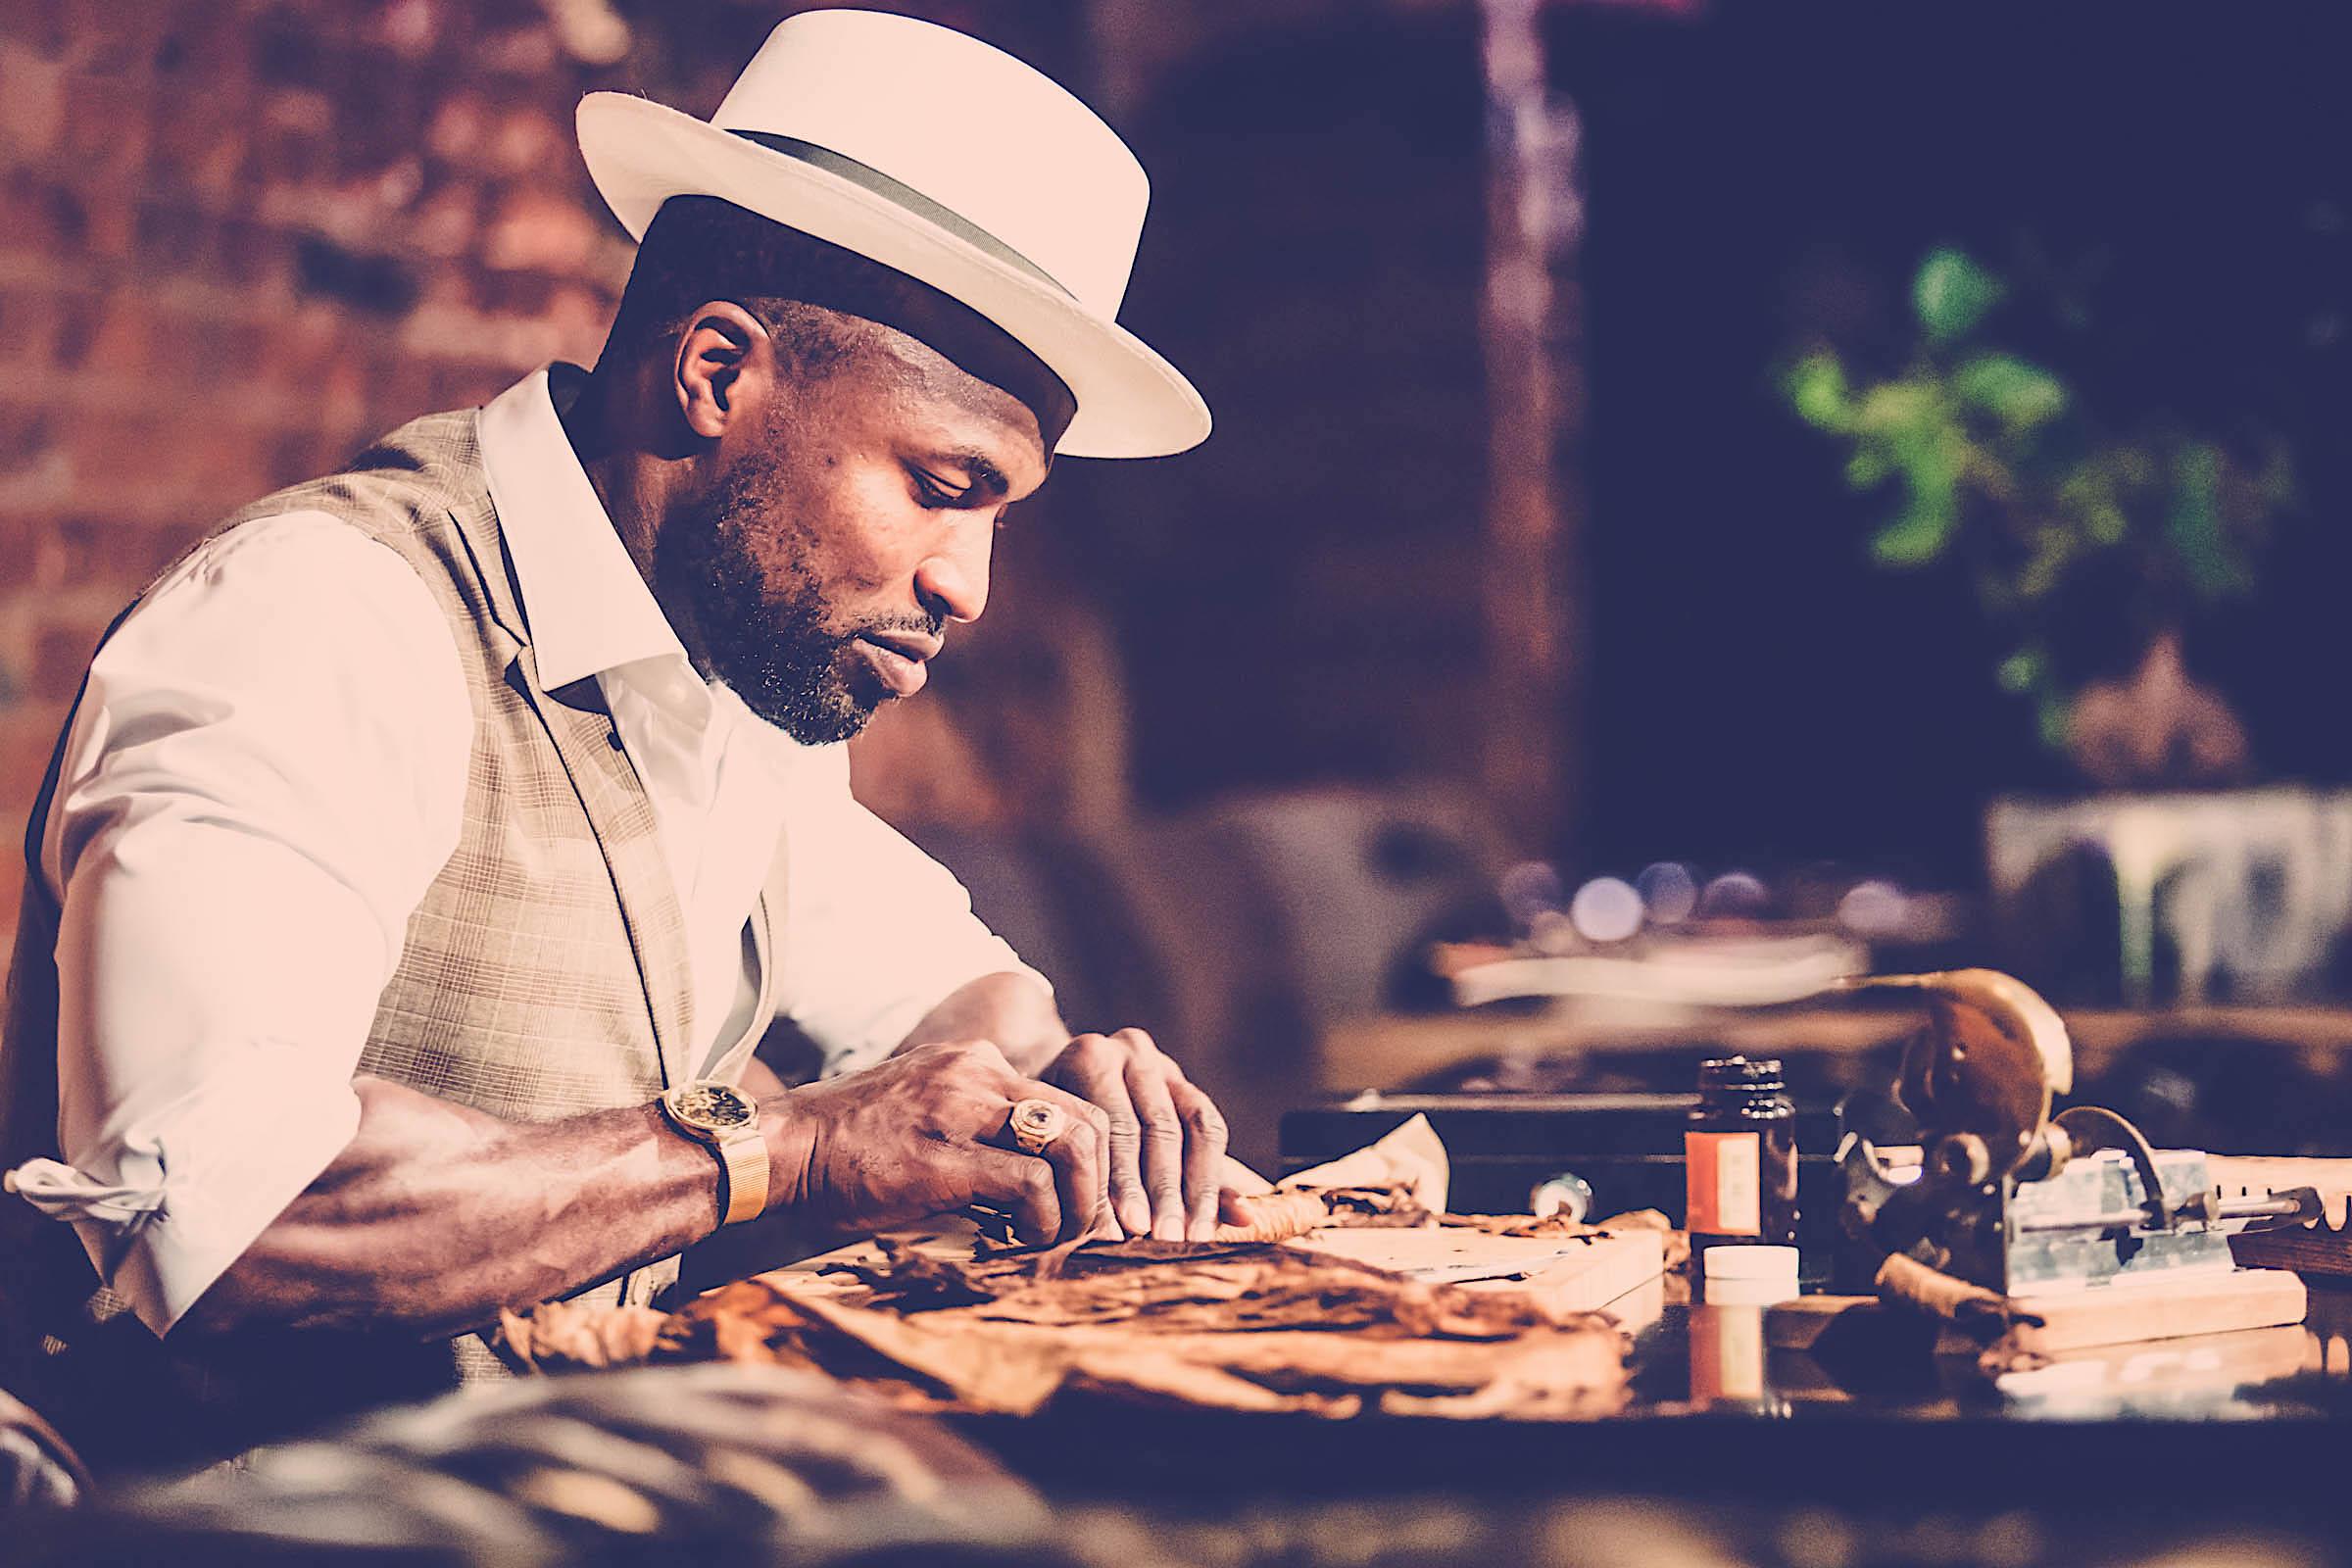 Zigarrendreher | Hamburg | Zigarrenroller | Zigarrenrollerin | Zigarren | Drehen | Mieten | Anfragen | Trocadero | Handgemacht | Eigenmarke | Robusto | Torpedo | Corona | Churchill | Banderole | Bauchbinde | Tabak | Brasilien | Cuba